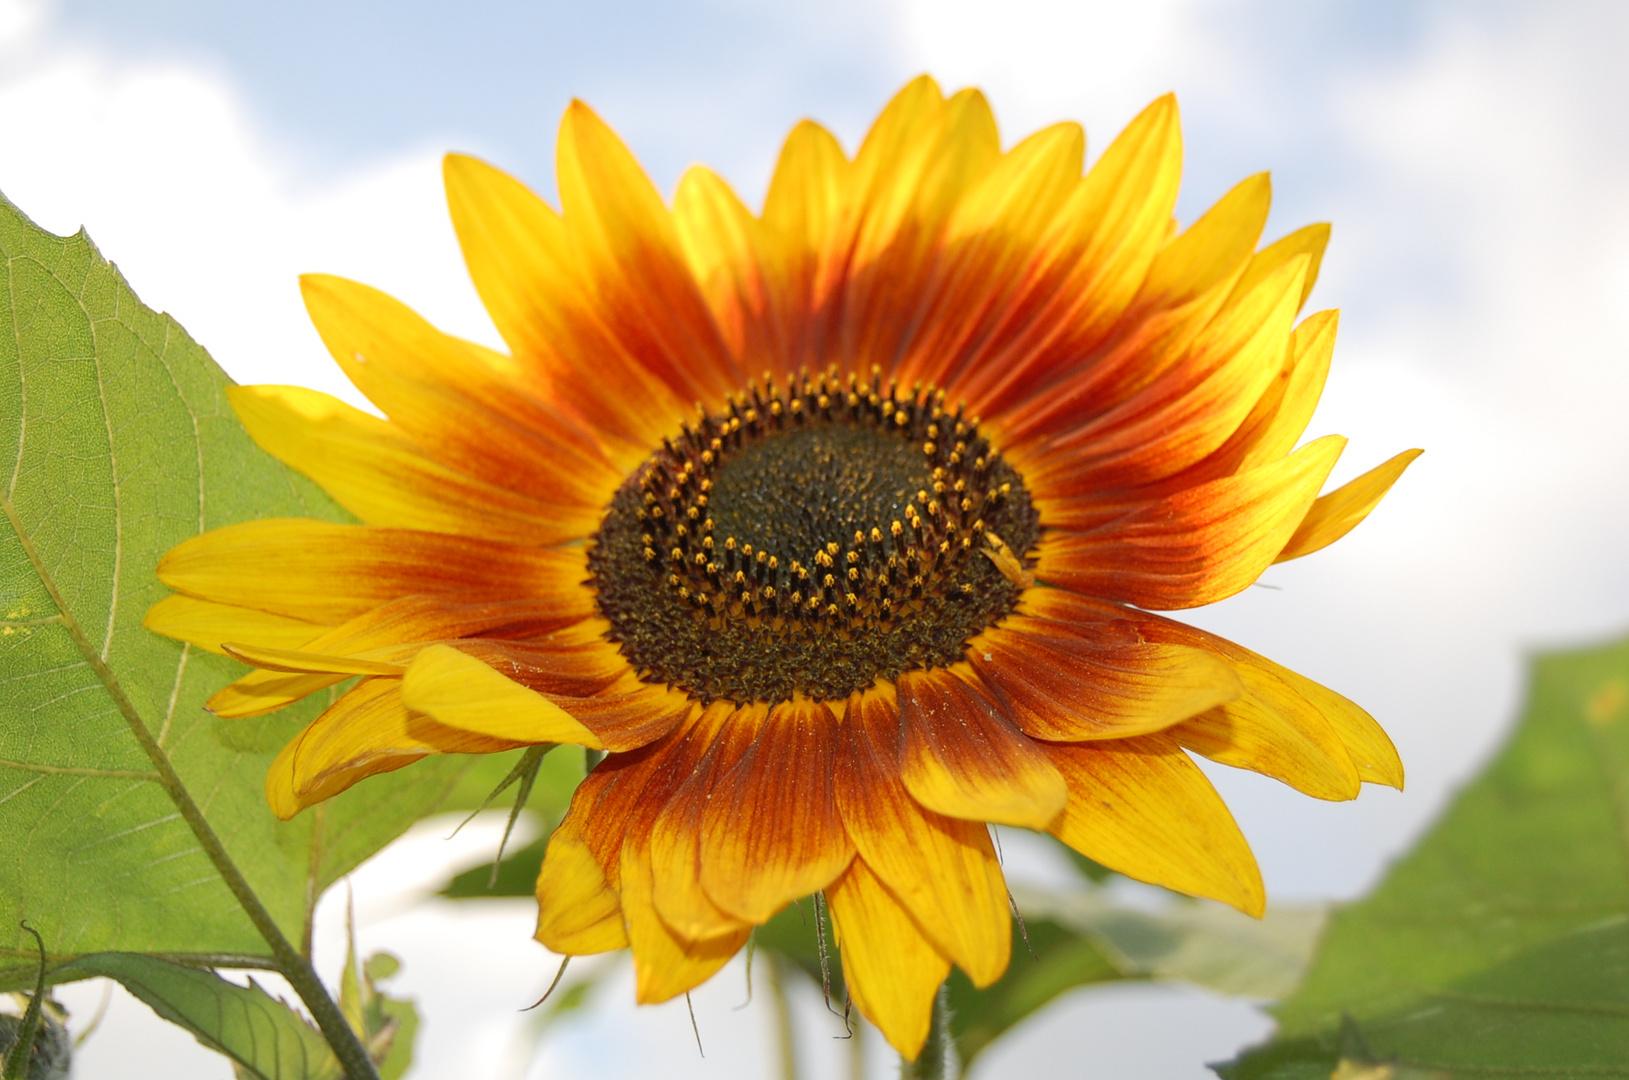 Sonnenblume bei uns im Garten